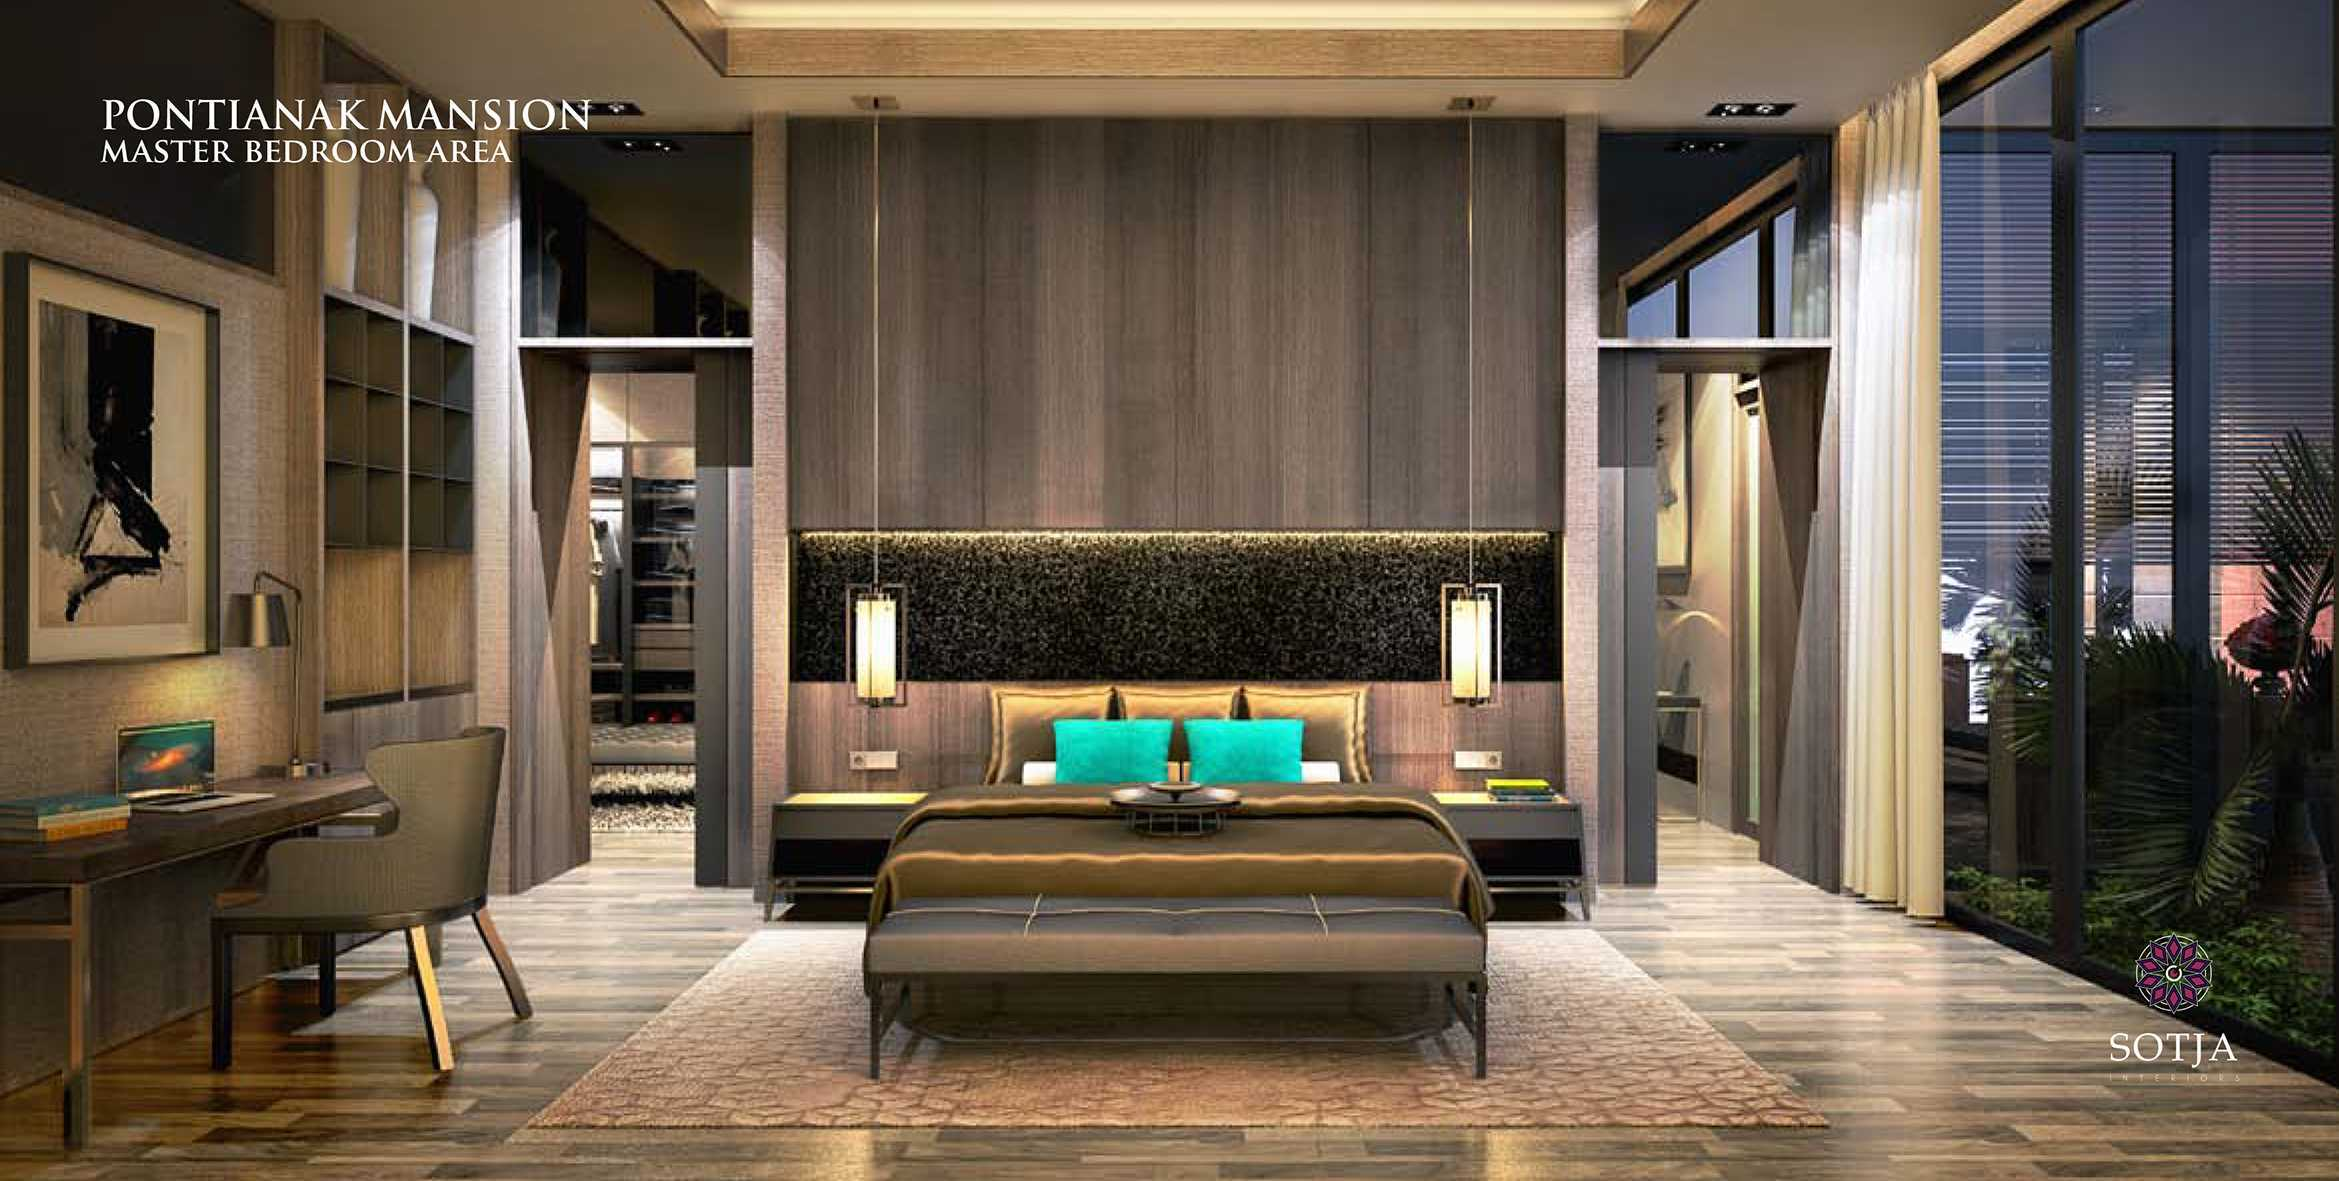 Sotja Interiors Pontianak Mansion Pontianak, Borneo Pontianak, Borneo Master Bedroom Area Modern  10039